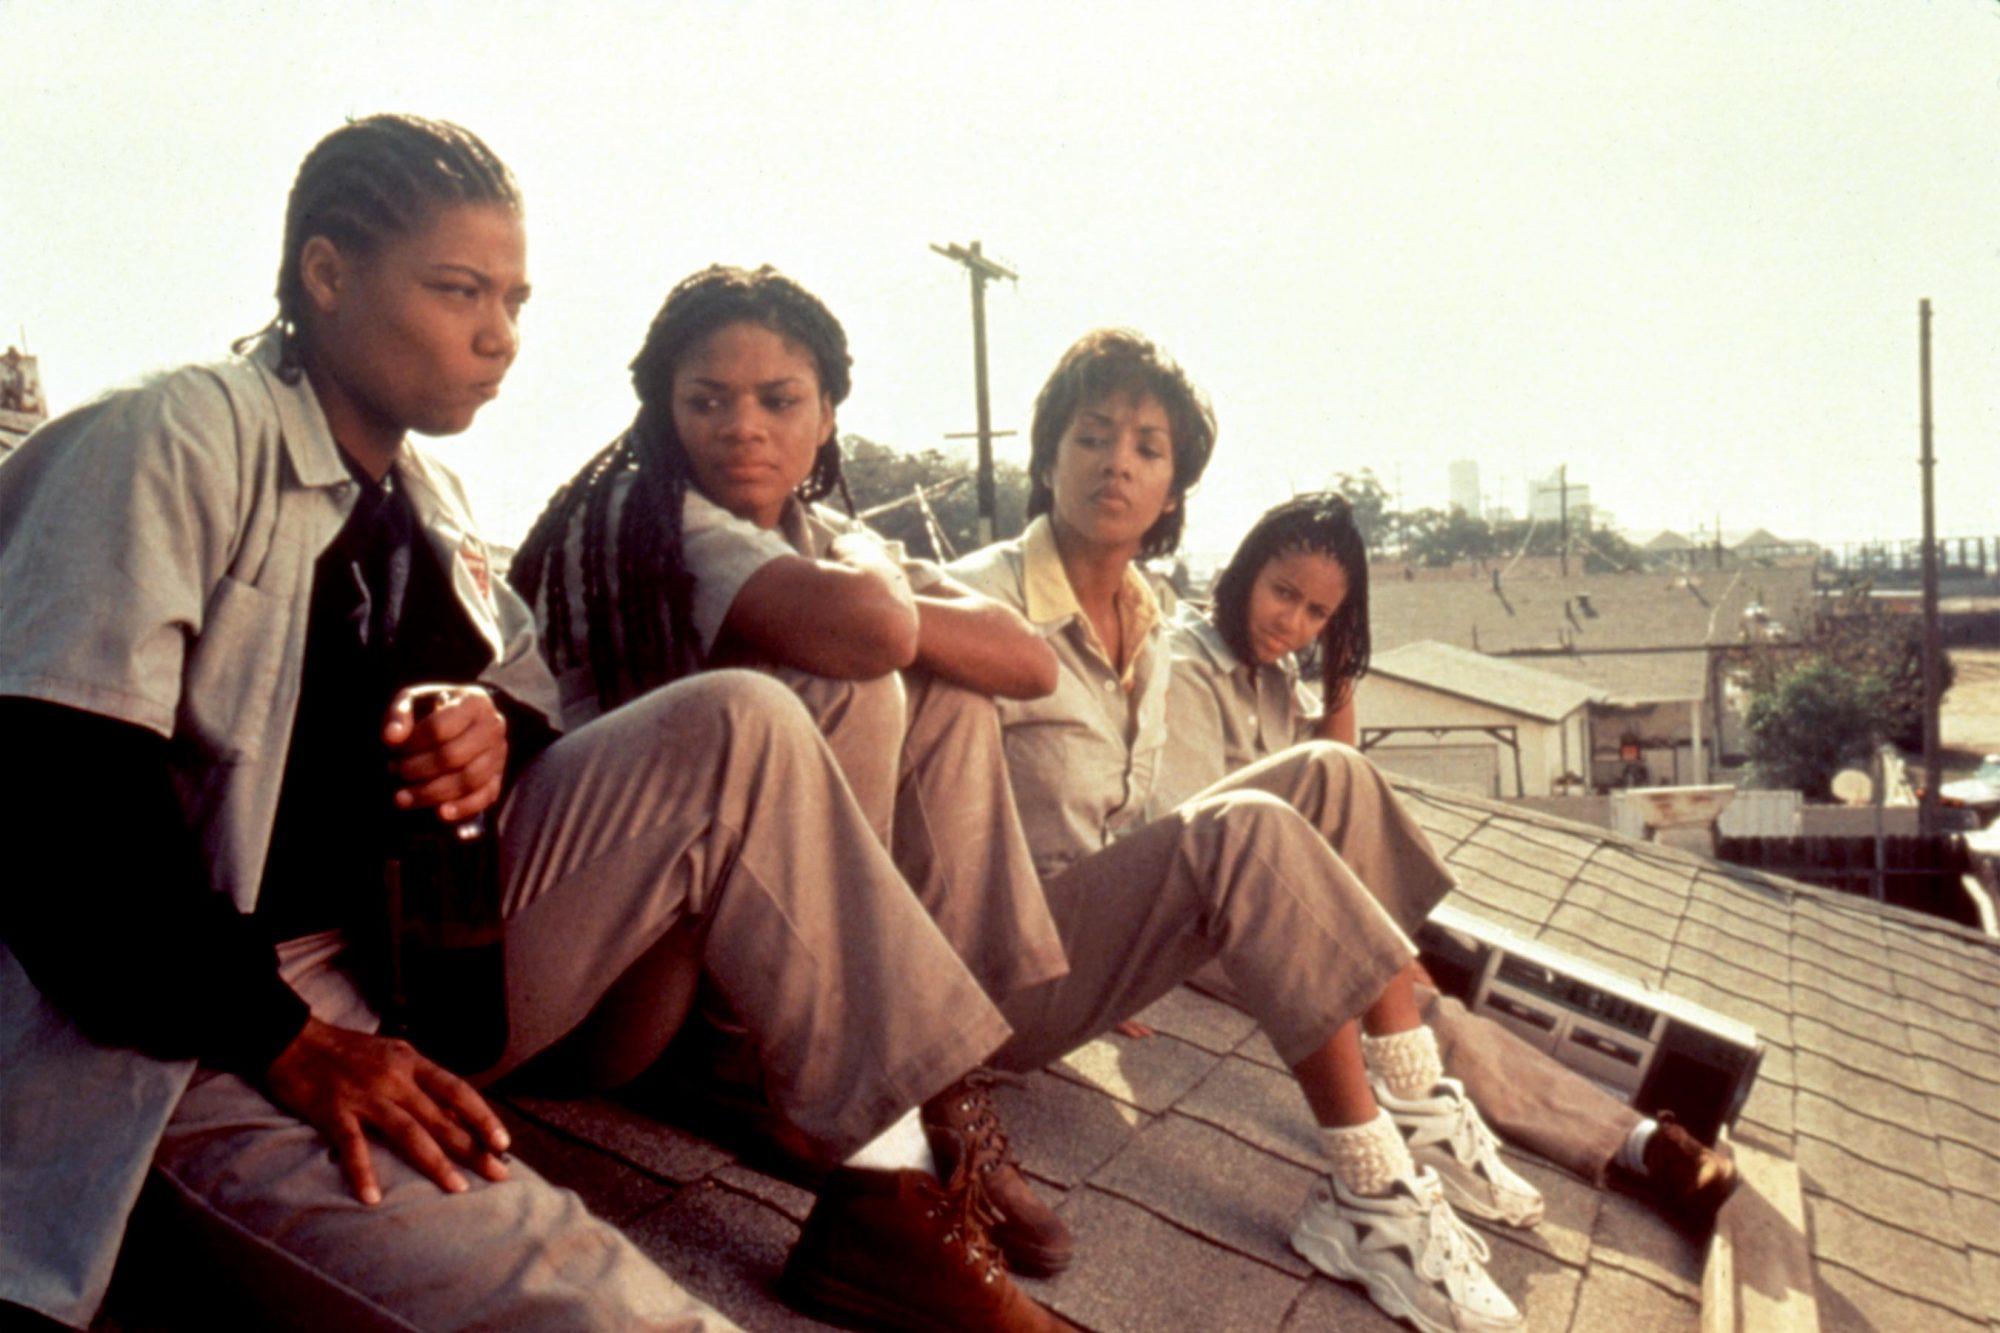 SET IT OFF, Queen Latifah, Kimberly Elise, Vivica A. Fox, Jada Pinkett, 1996, (c)New Line Cinema/courtesy Everett Collection